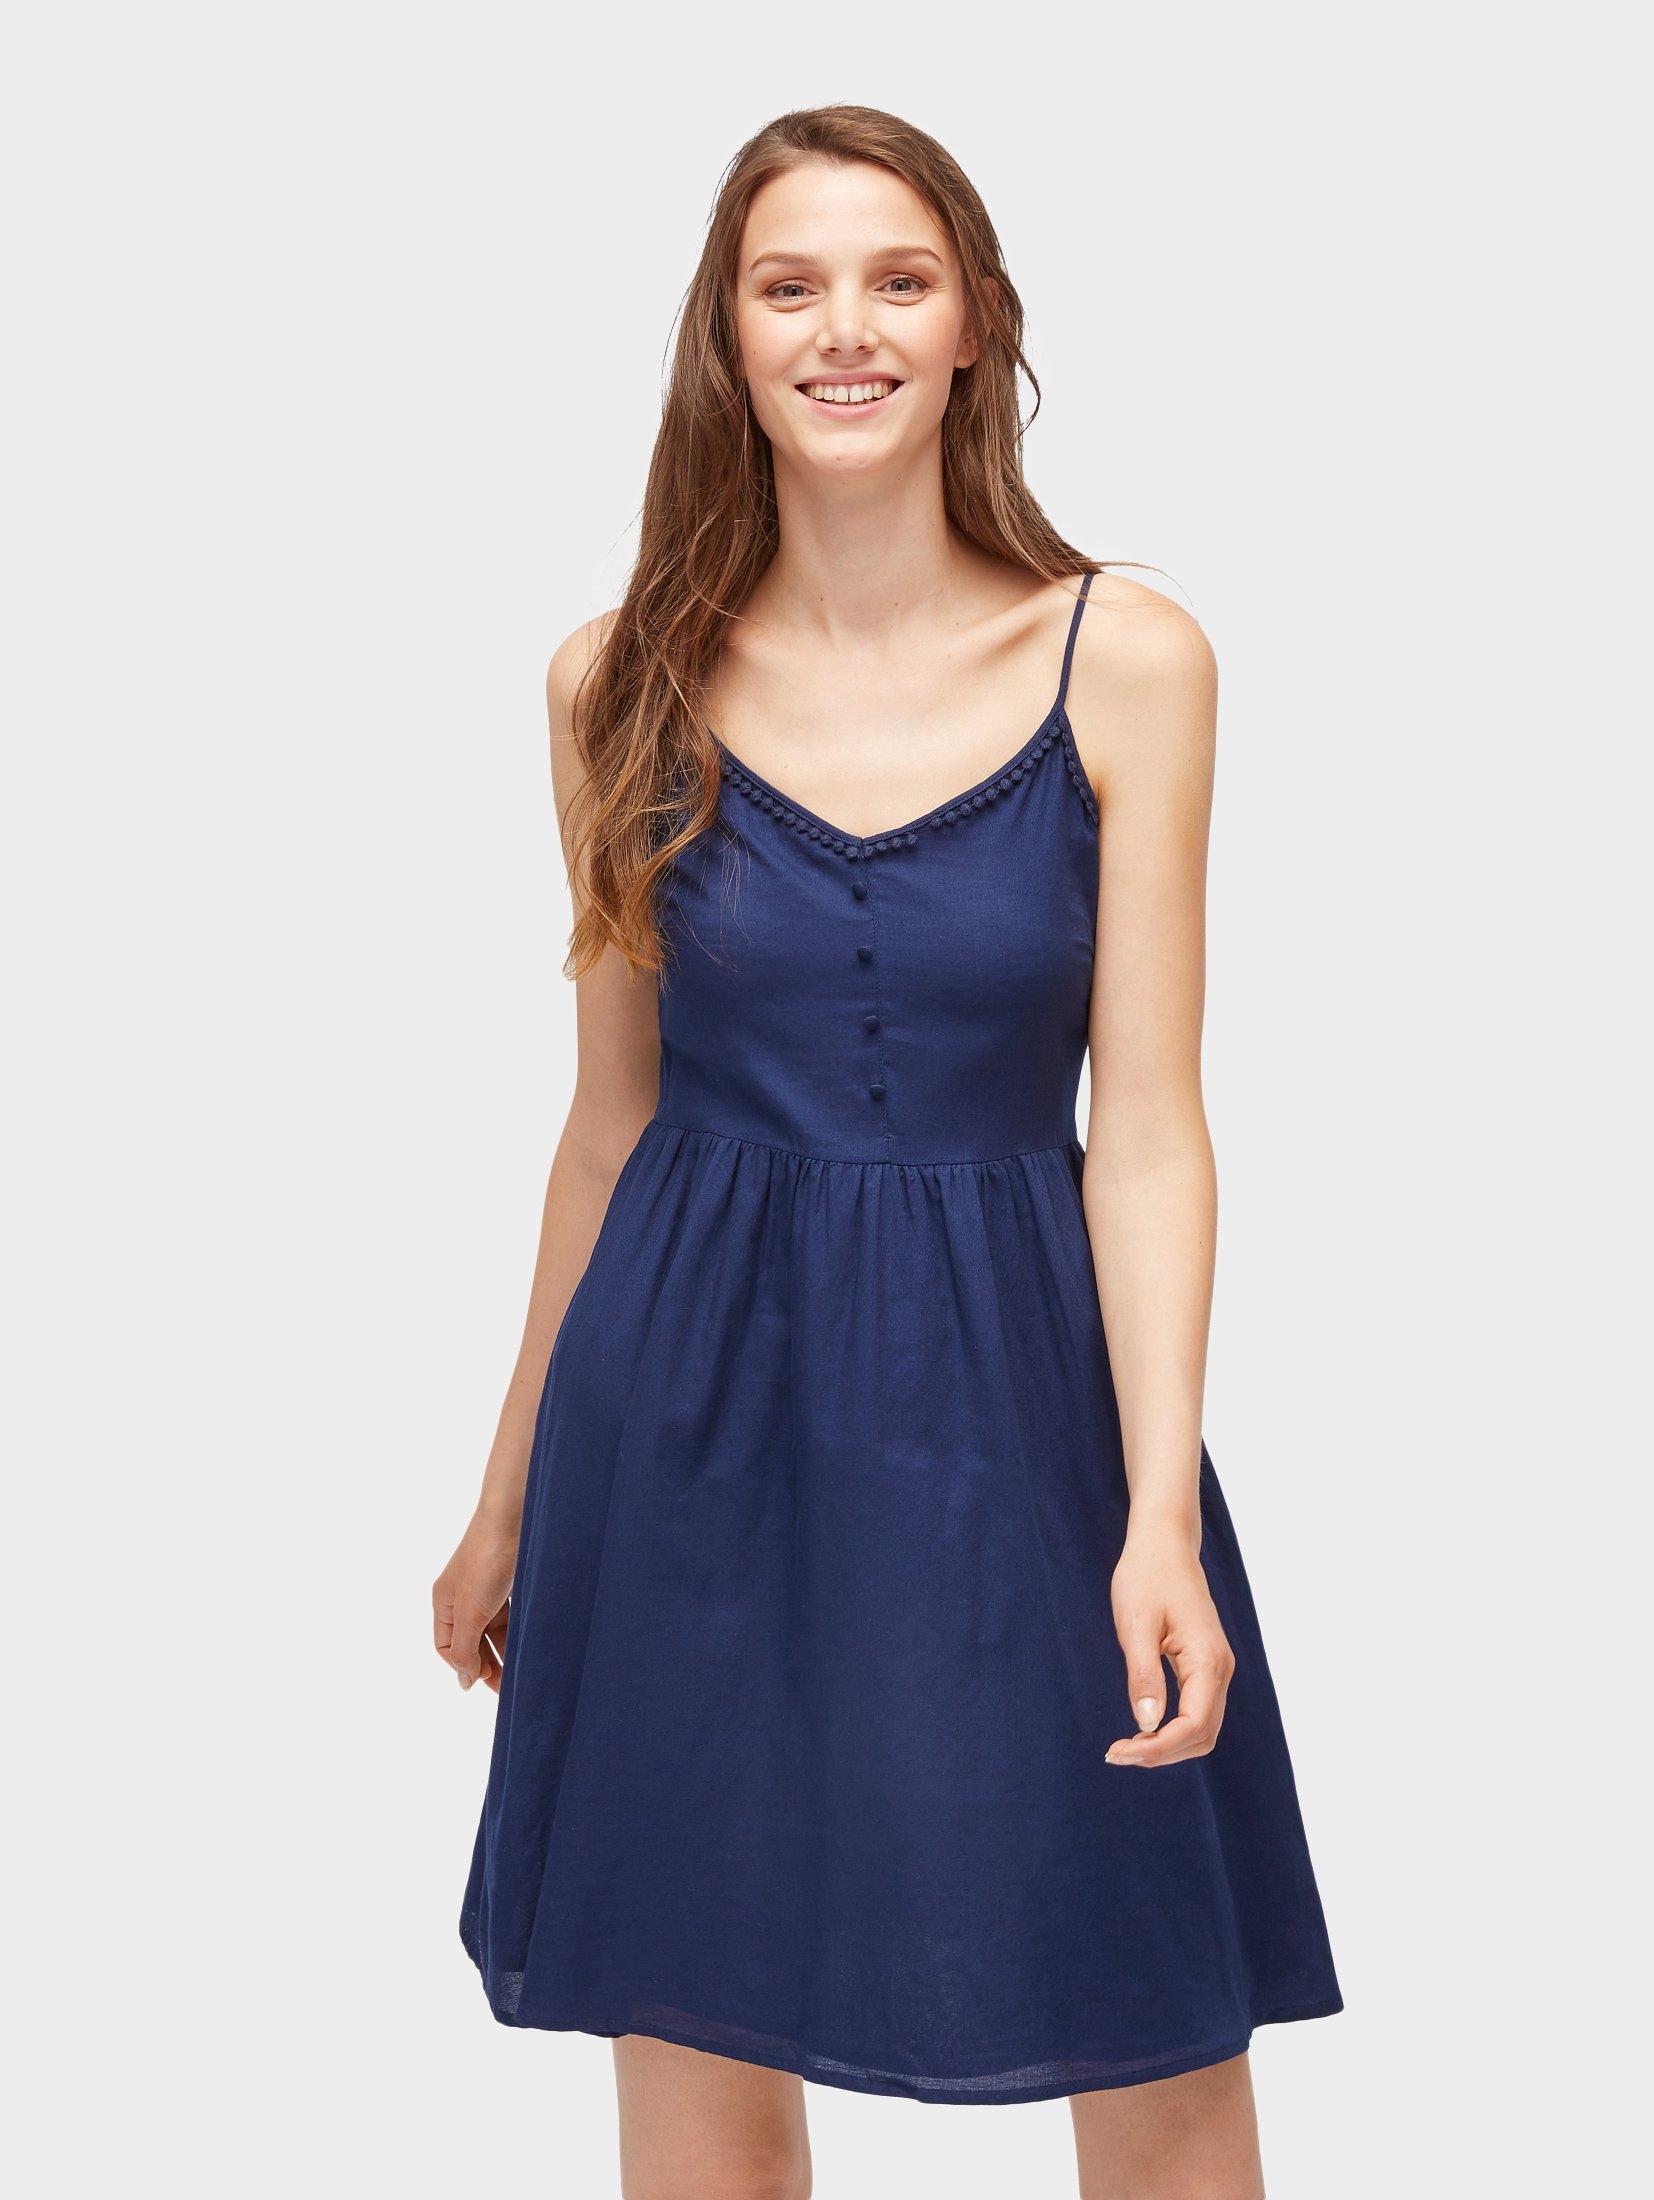 1ebd0c8e9483d1 Afbeeldingsbron  Tom Tailor Denim jurk met spaghettibandjes »mouwloze jurk«